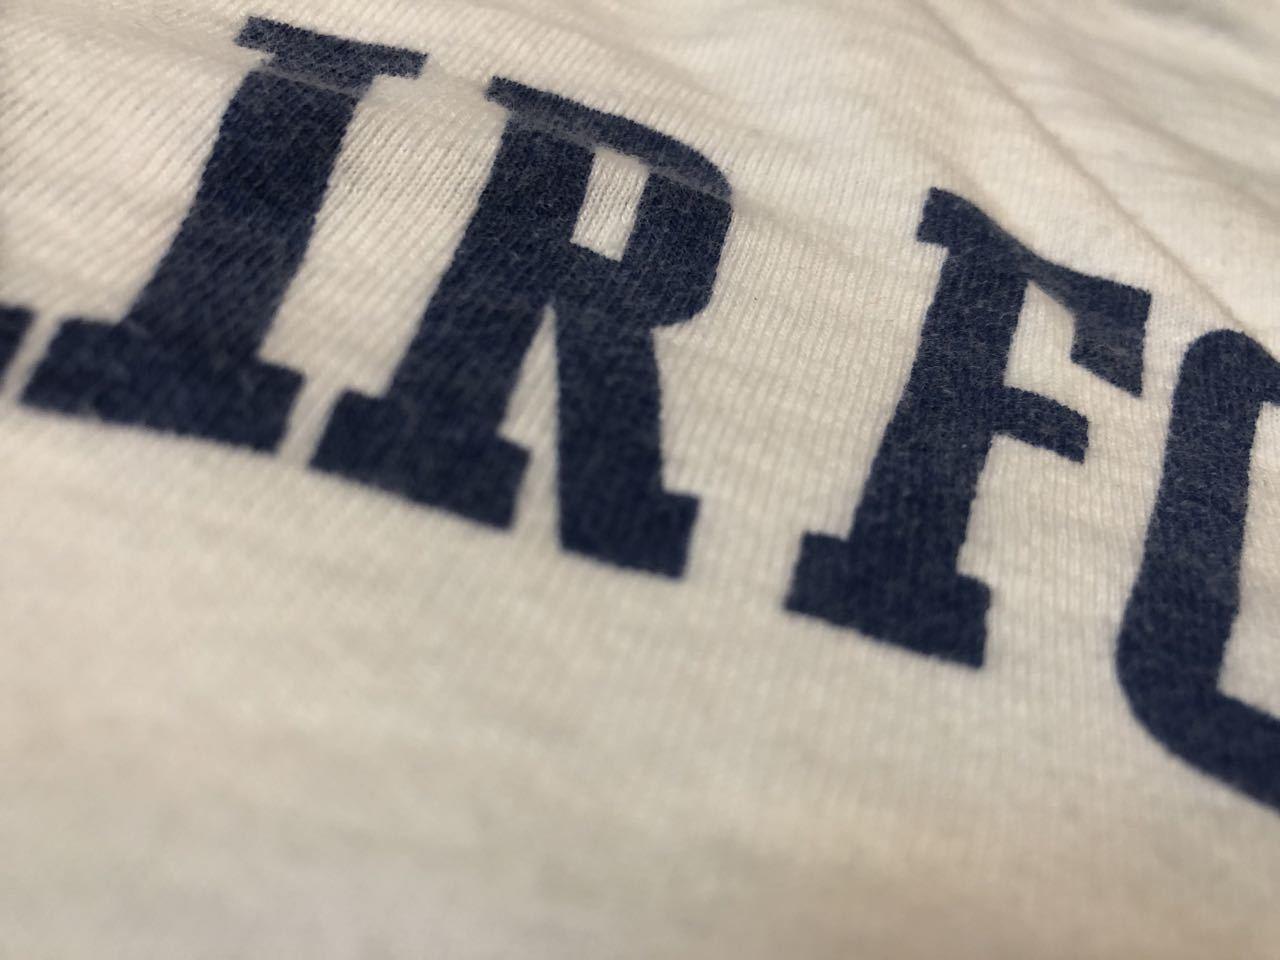 5月18日(土)入荷! 70s  U.S.A.F  all cotton 染み込み Tシャツ!_c0144020_13360685.jpg